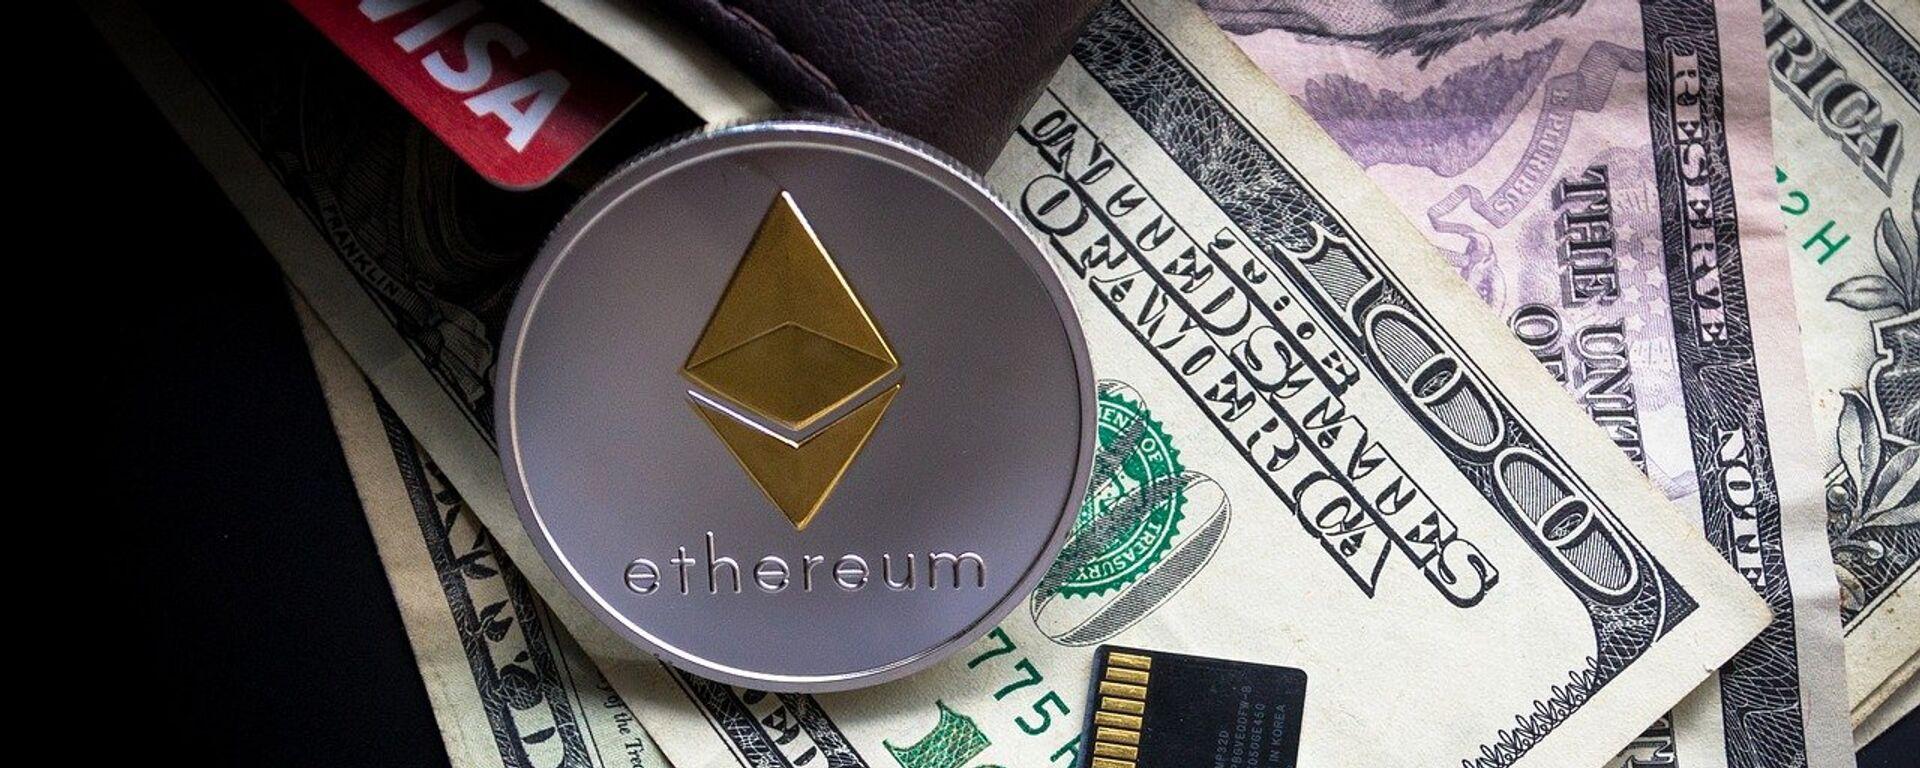 Ethereum, moneda criptográfica, y billetes de dólares estadounidenses - Sputnik Mundo, 1920, 25.05.2021